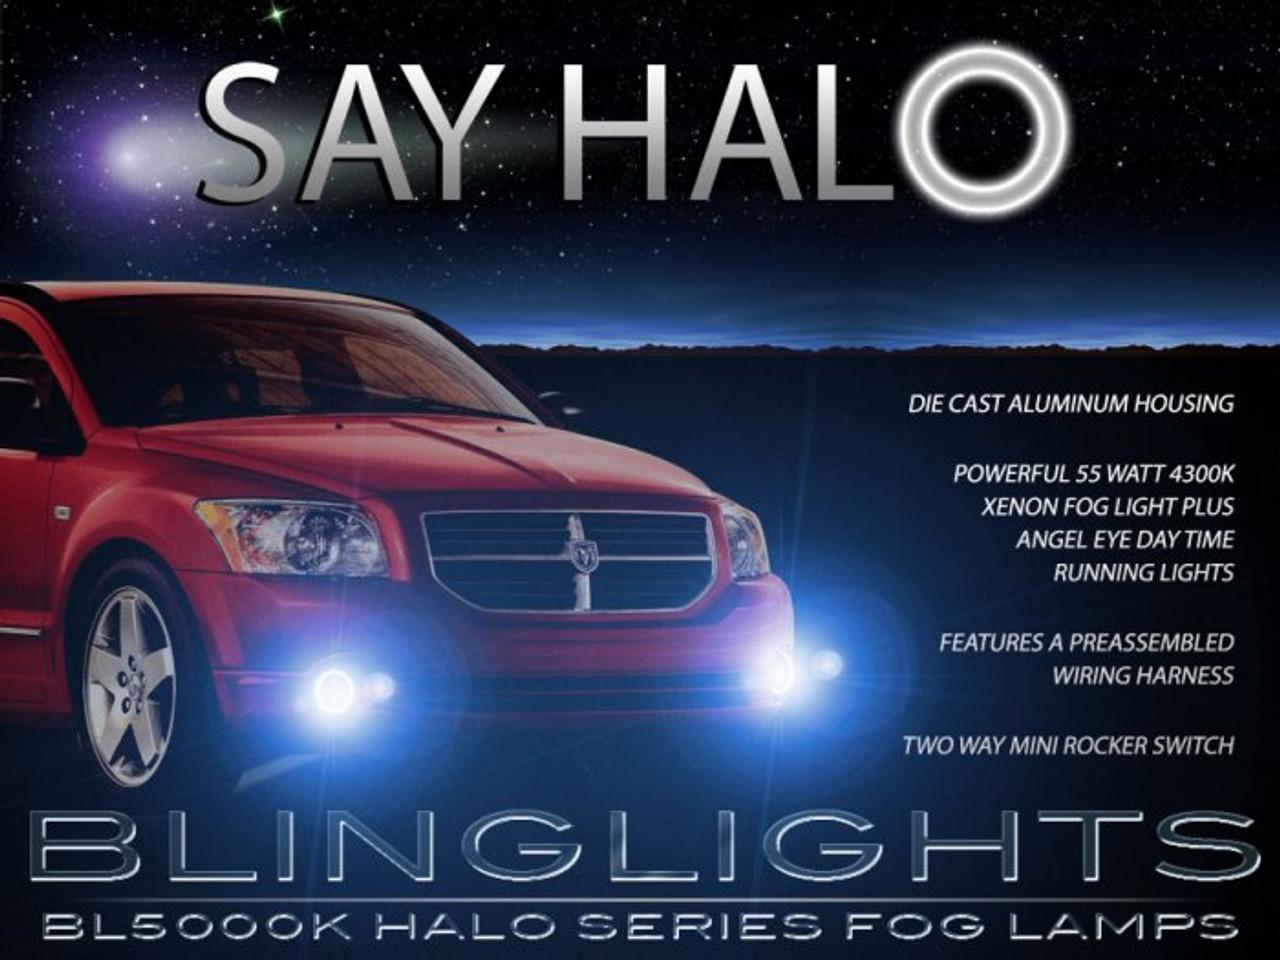 2007 2008 2009 2010 2011 Dodge Caliber Angel Eye Halo Foglamps Foglights Driving Fog Lamps Lights